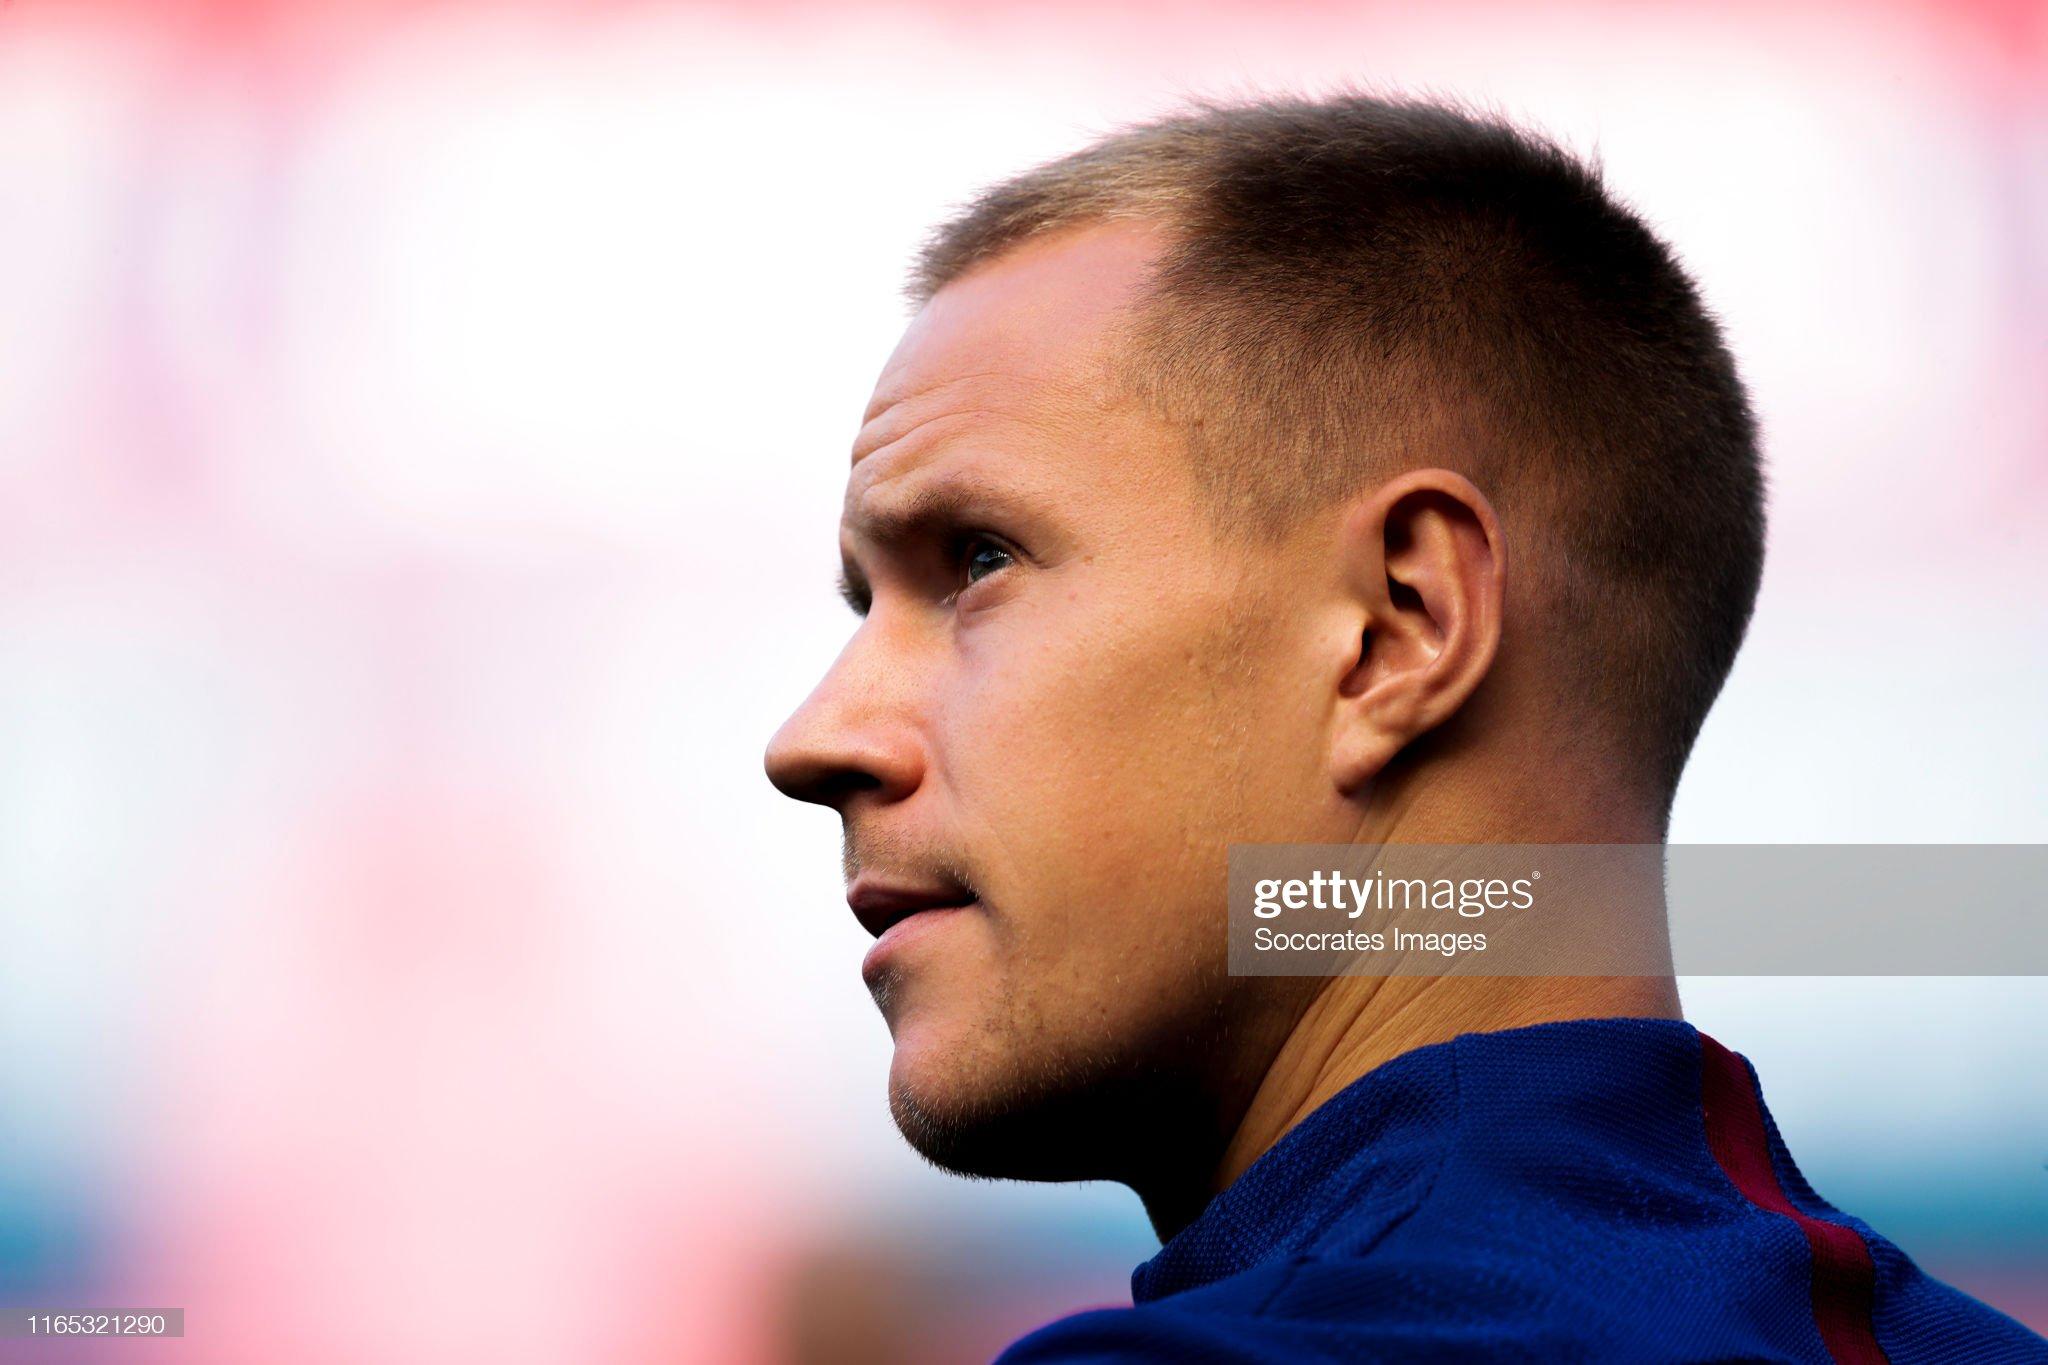 صور مباراة : أوساسونا - برشلونة 2-2 ( 31-08-2019 )  Marc-andre-ter-stegen-of-fc-barcelona-during-the-la-liga-santander-picture-id1165321290?s=2048x2048